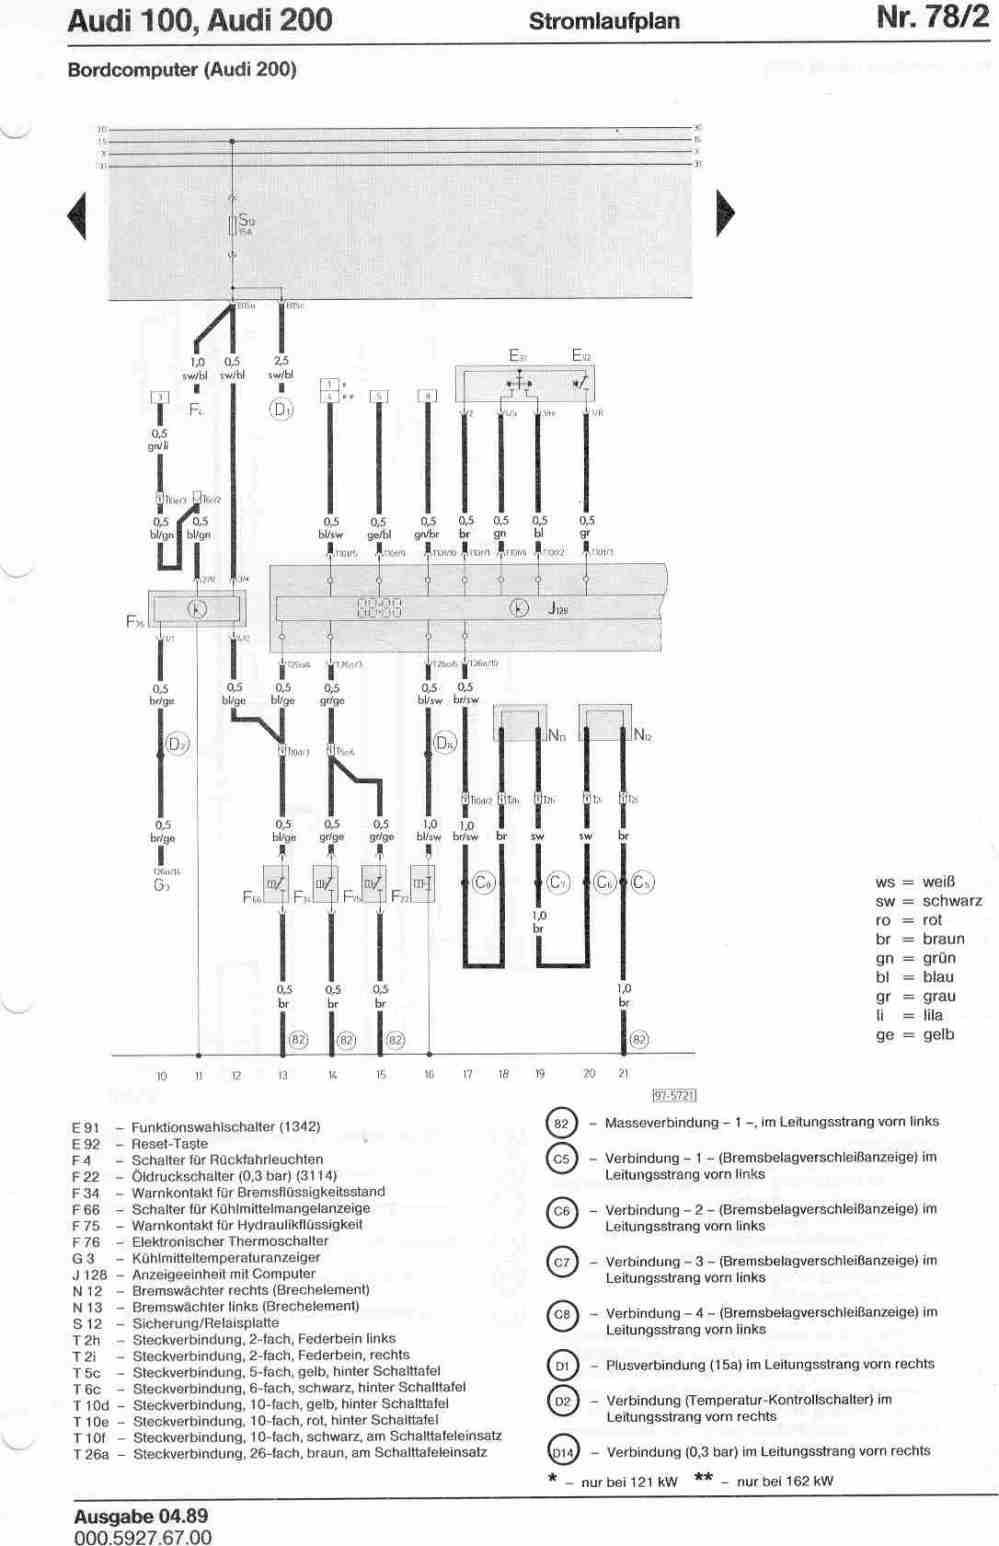 medium resolution of audi 200 wiring diagram wiring diagram articleaudi 100 200 factory wiring diagrams audi 200 wiring diagram